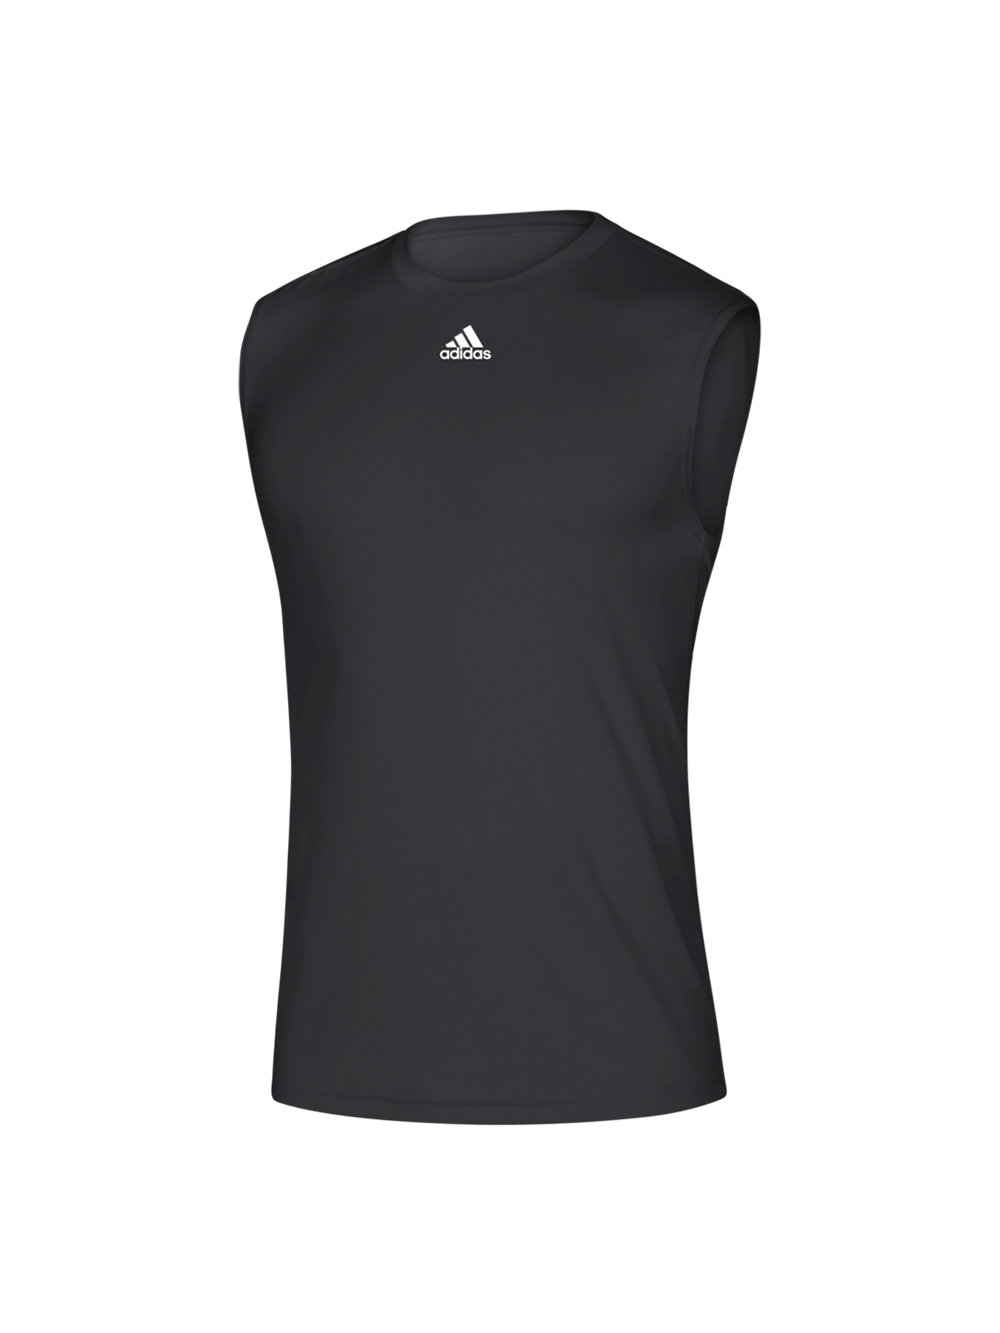 Adidas Mens Creator Sleeveless Tee   Midwest Volleyball Warehouse